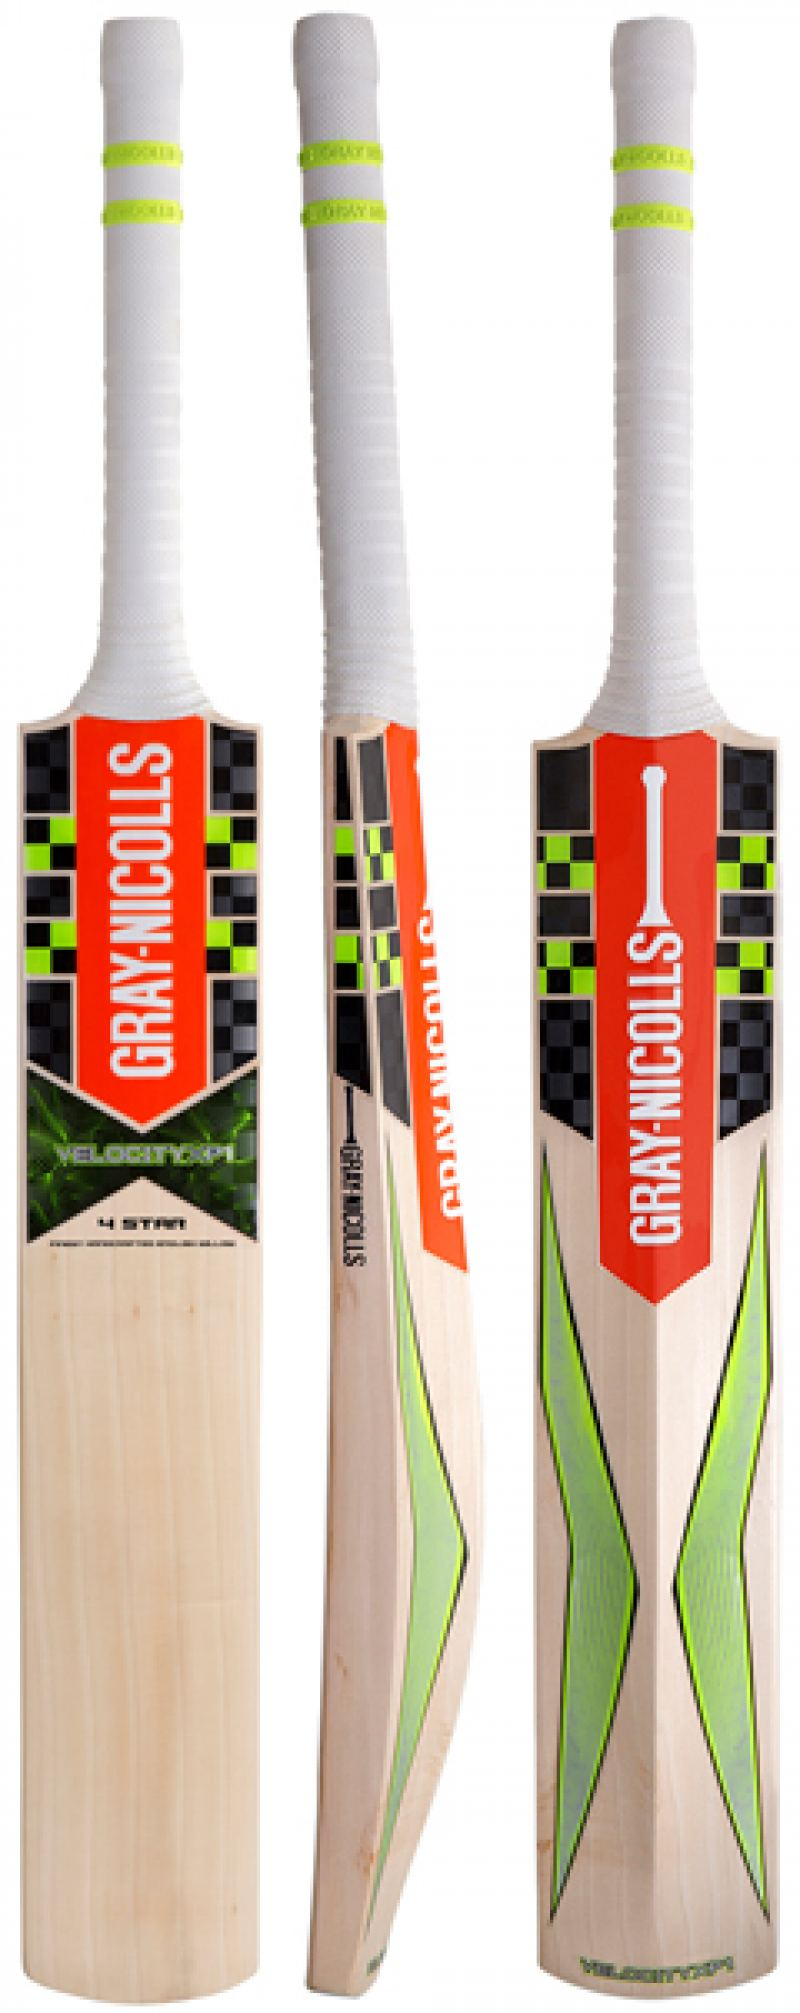 Gray Nicolls Velocity XP1 4 Star Cricket Bat